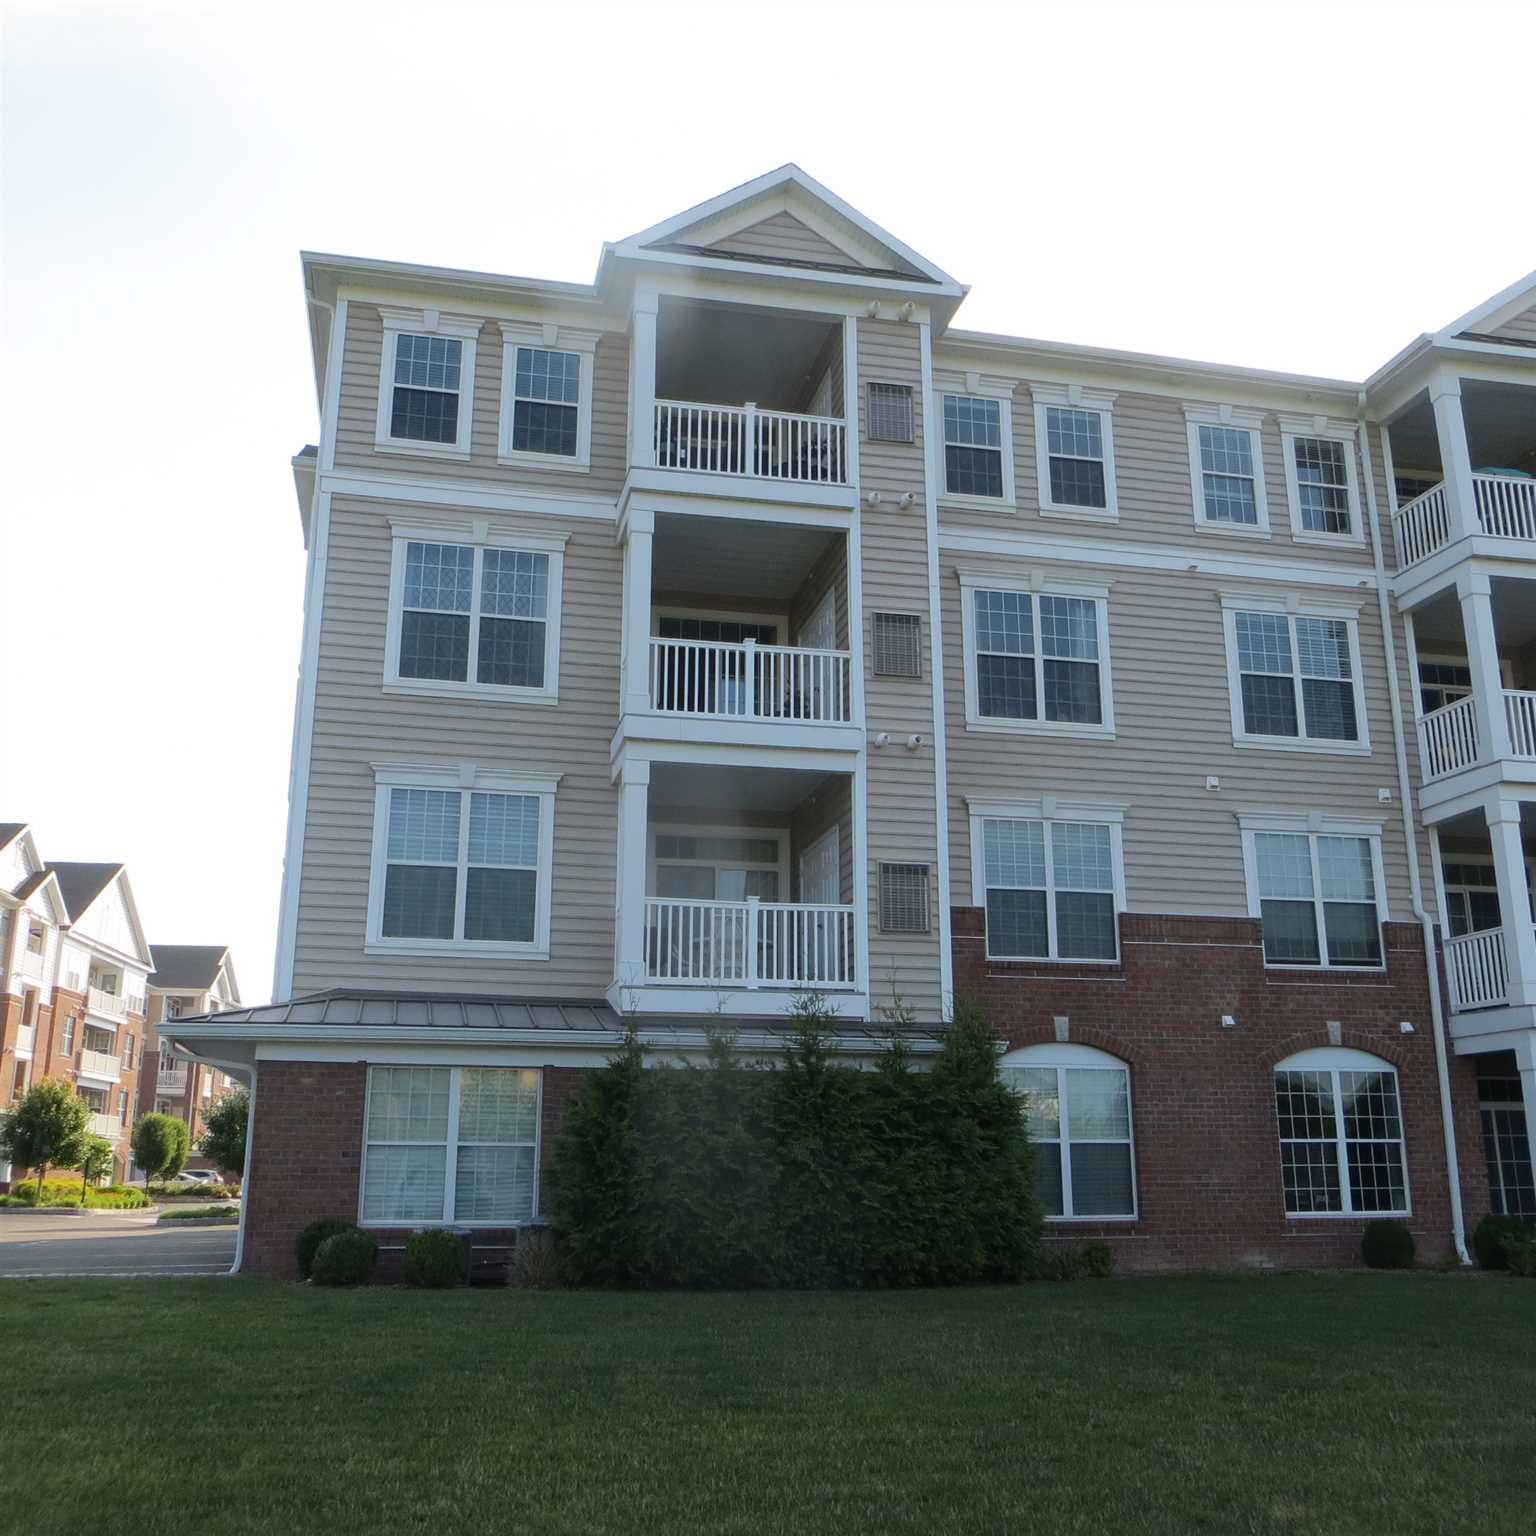 Single Family Home for Sale at 724 REGENCY Drive 724 REGENCY Drive Fishkill, New York 12524 United States